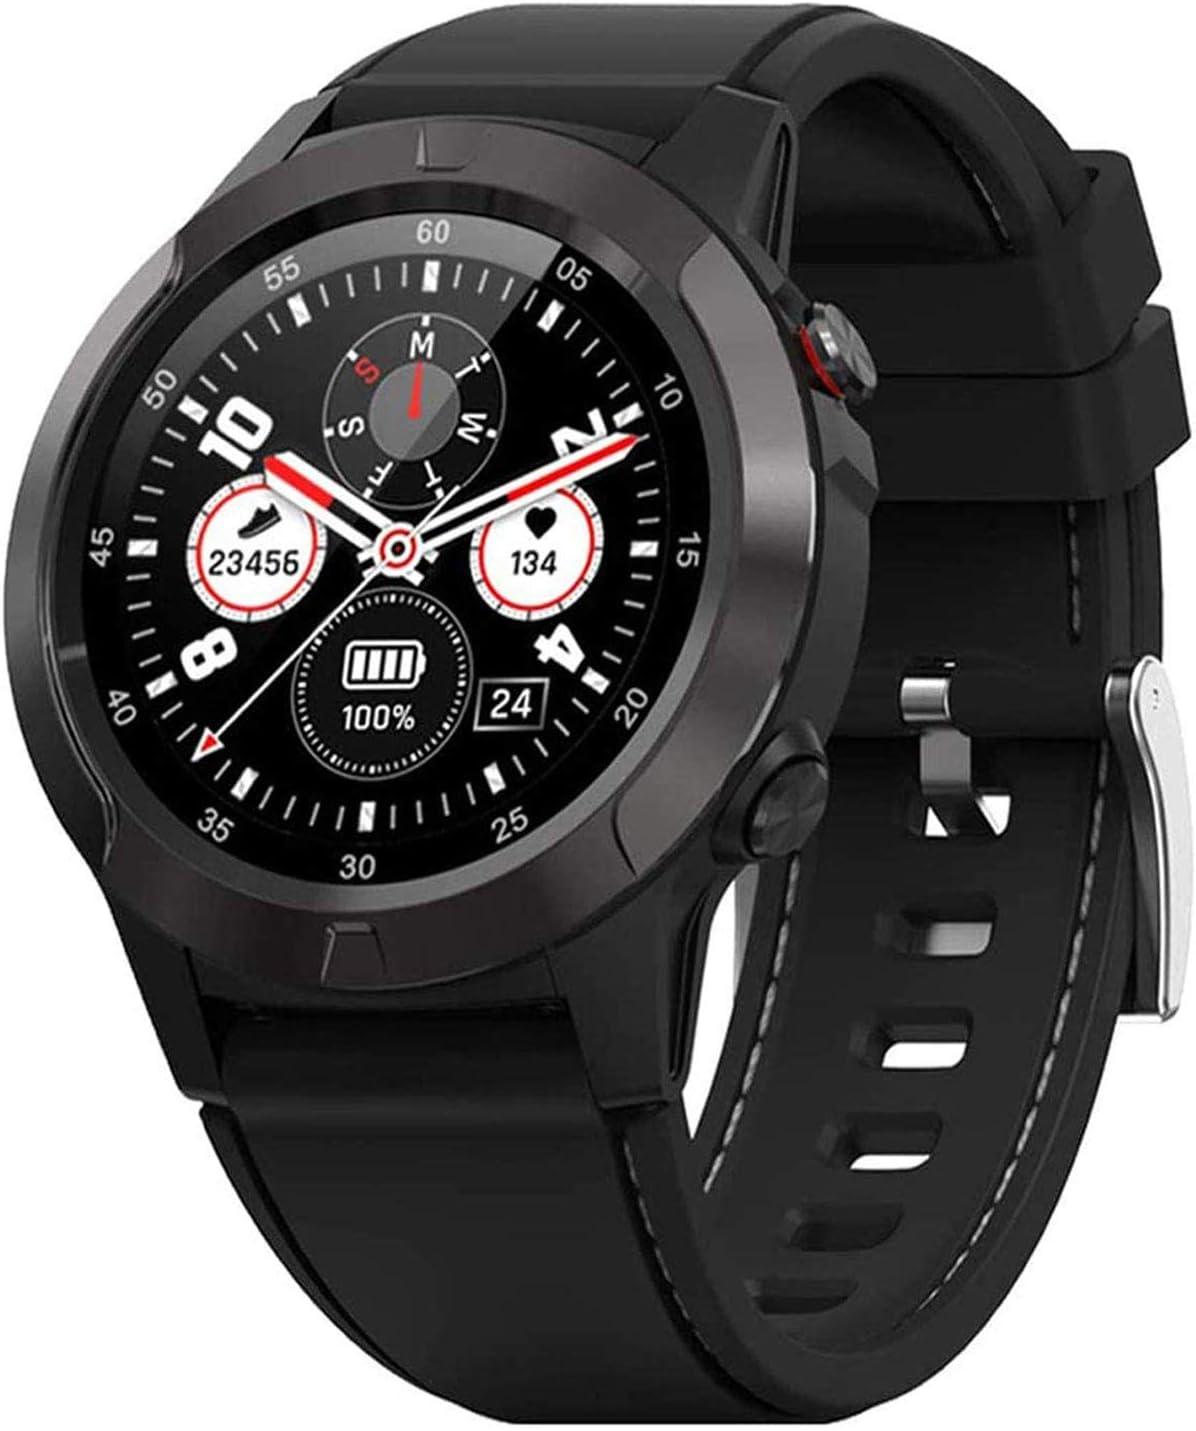 Gandley Smart Watch